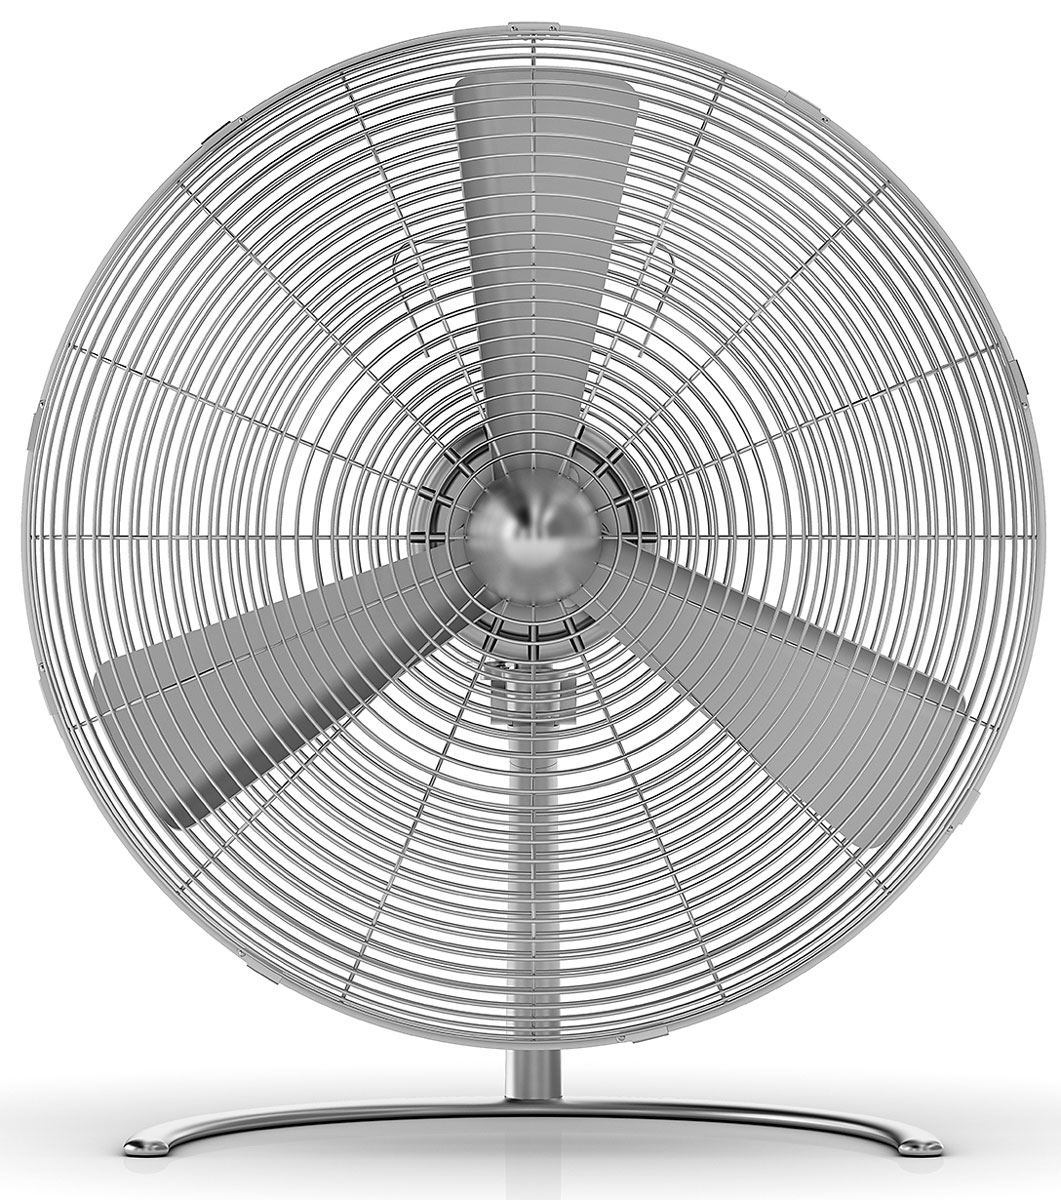 цена на Stadler Form Charly Fan Table New, Silver вентилятор настольный